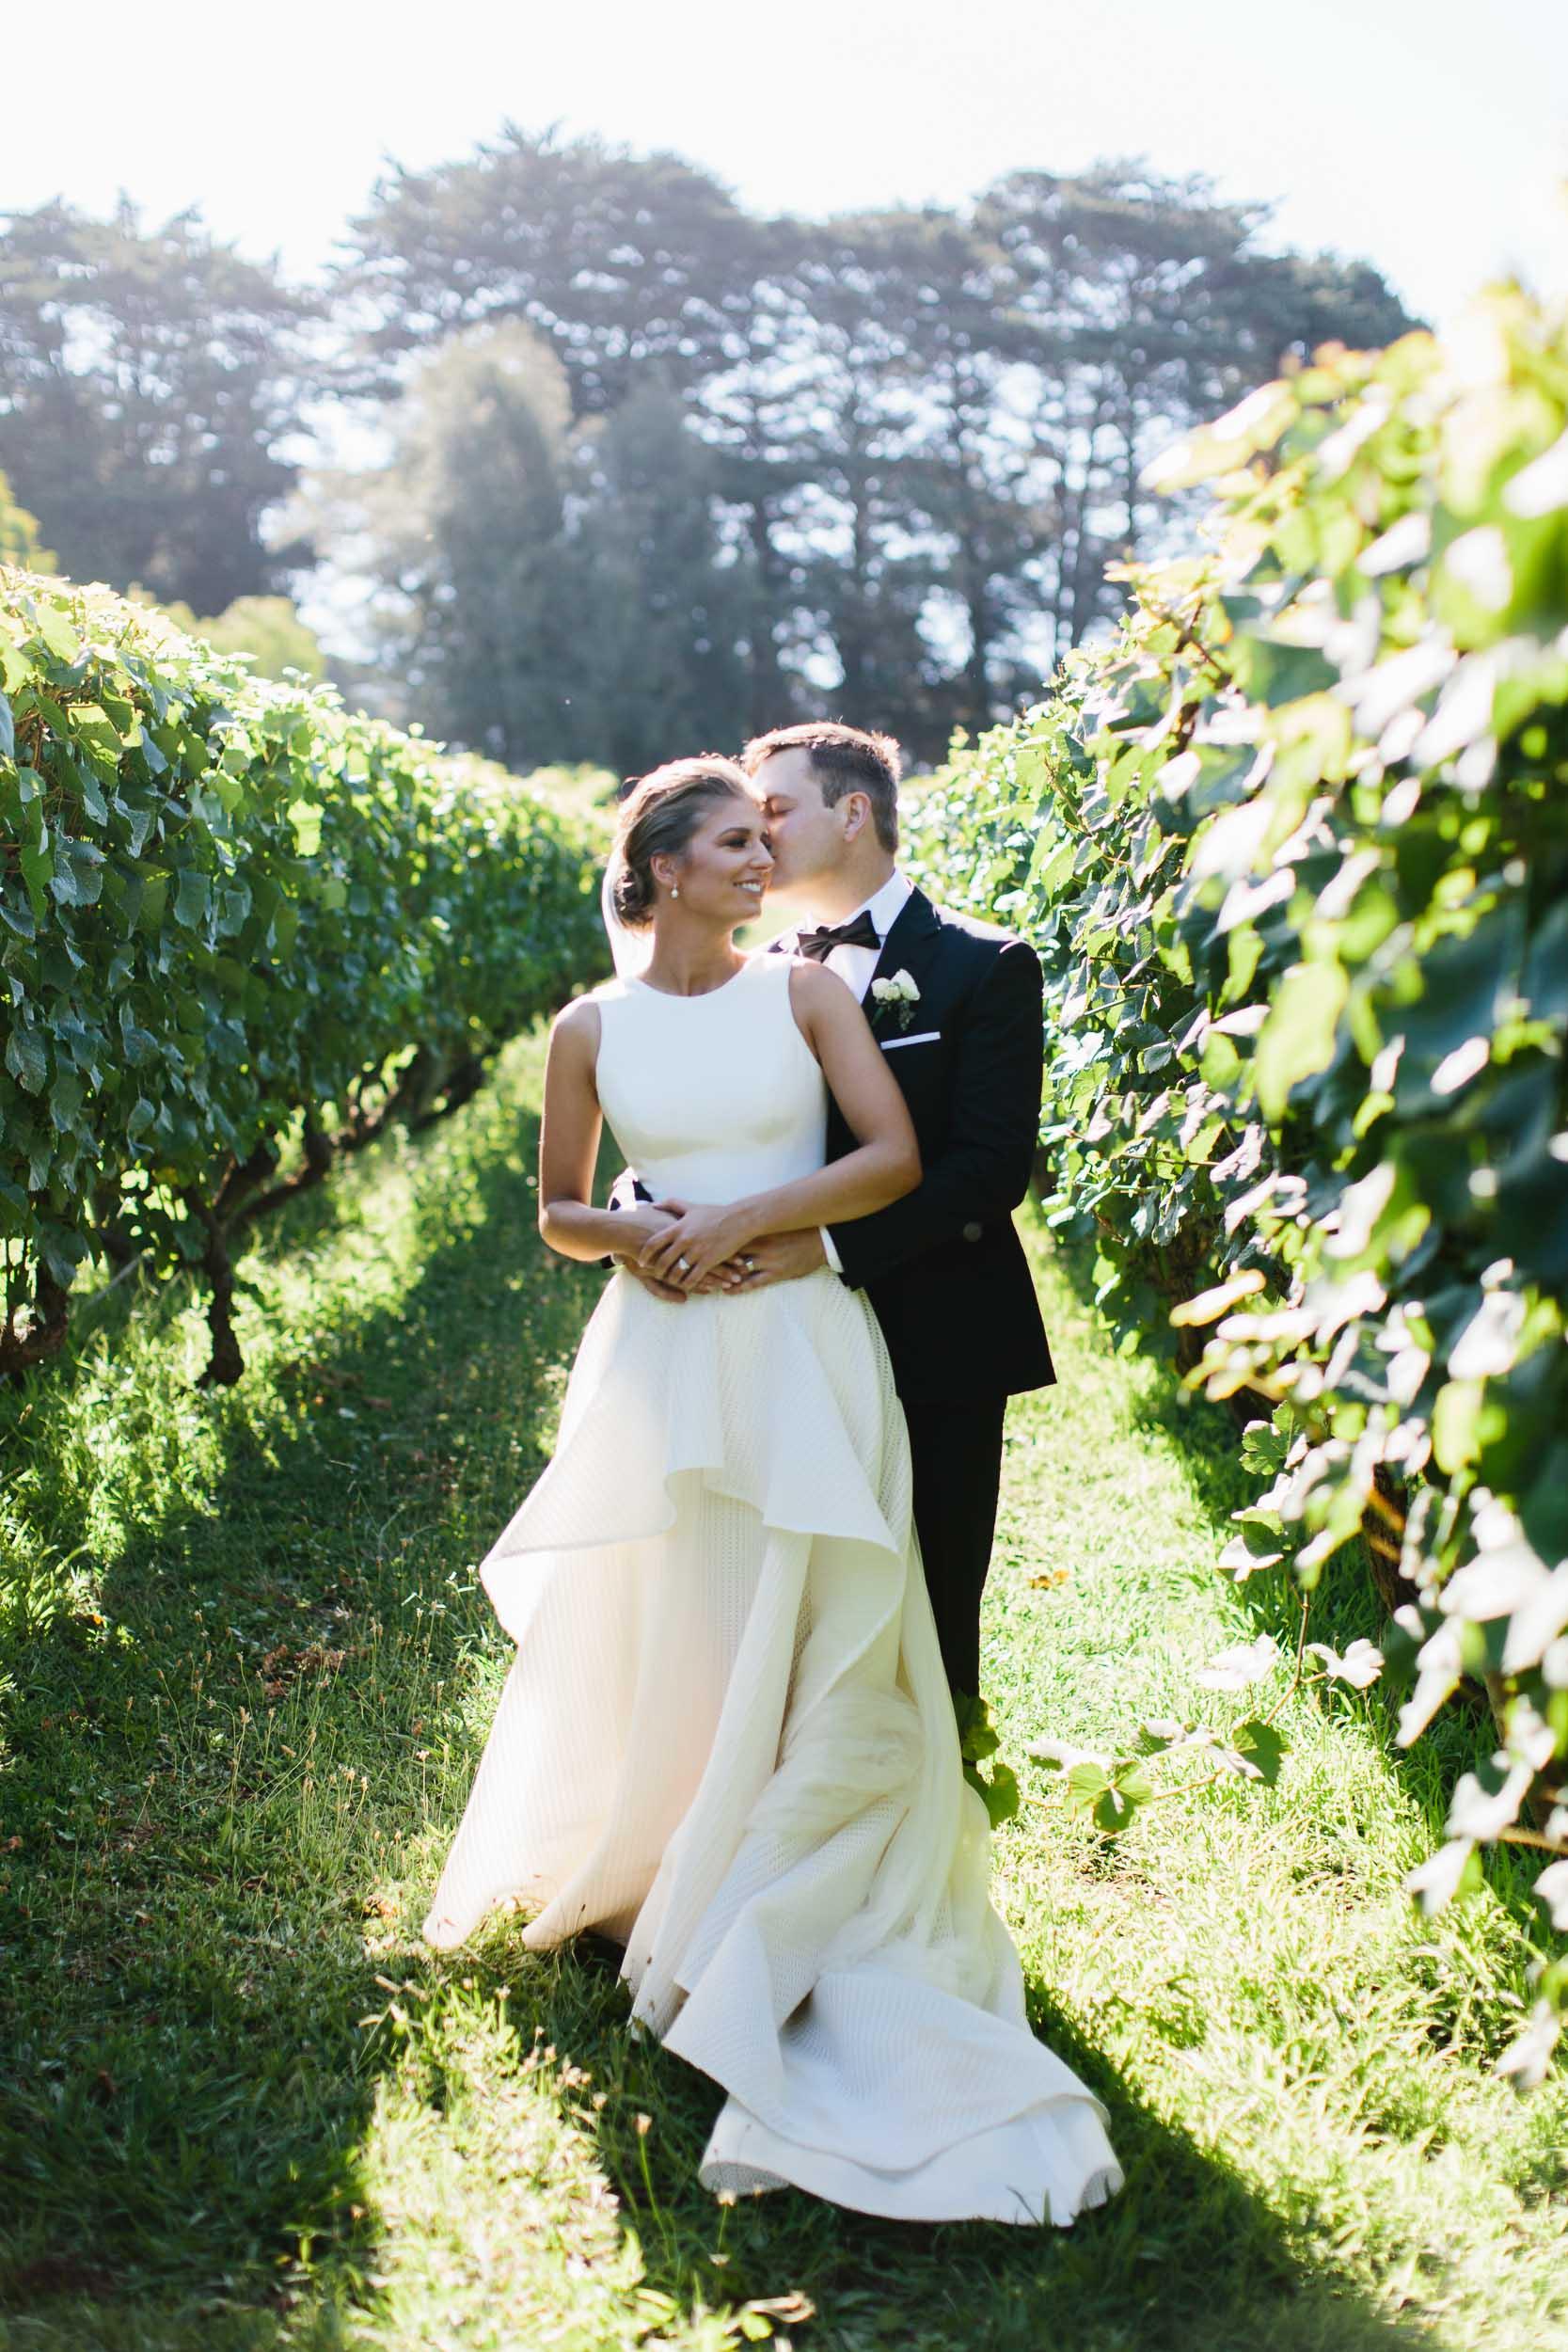 Kas-Richards-Mornington-Peninsula-Wedding-Lindenderry-Red-Hill-453.jpg